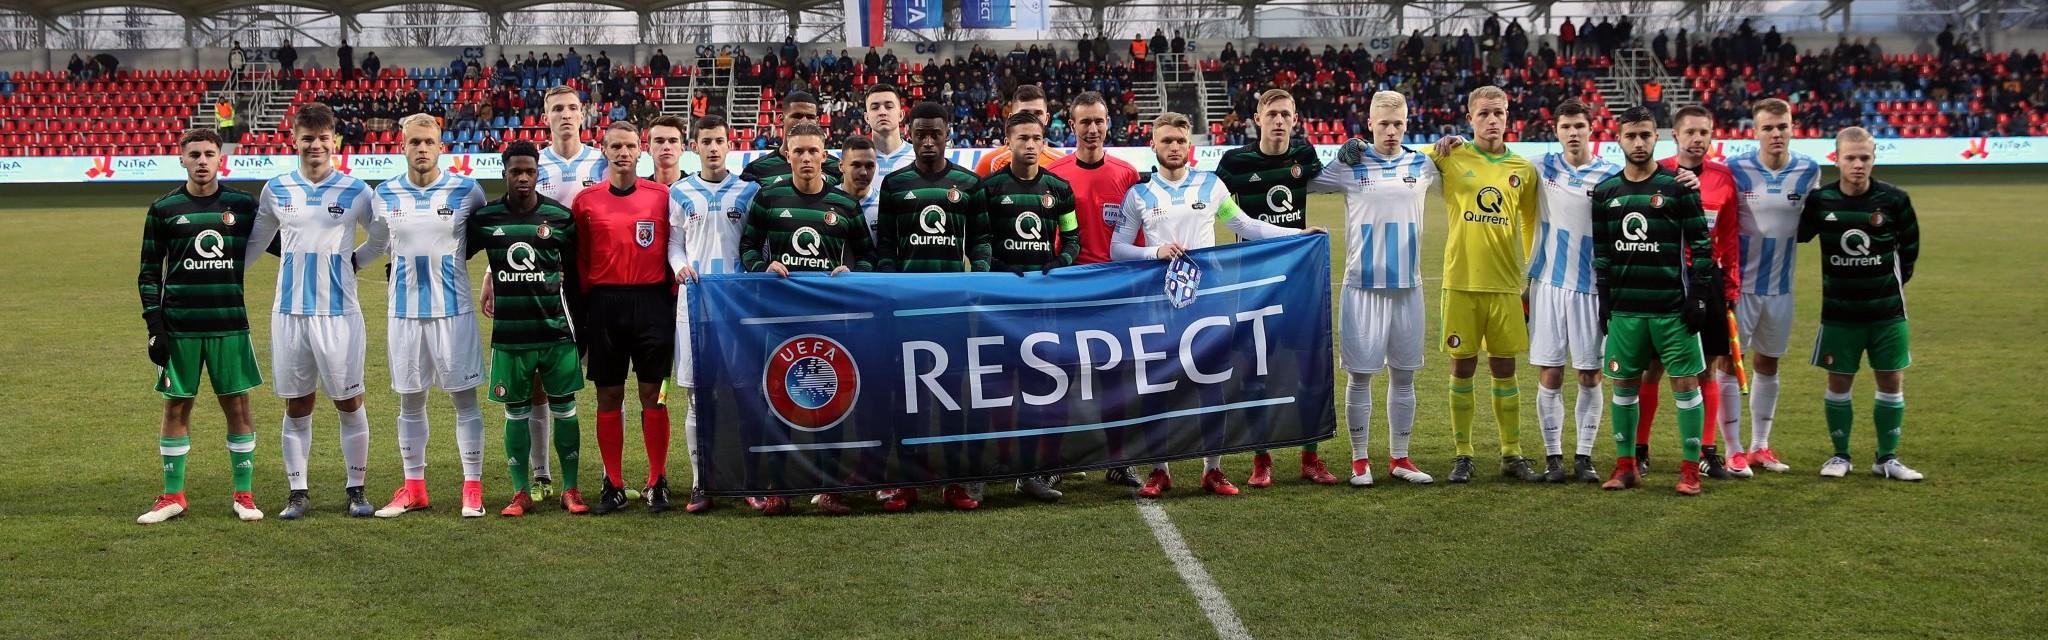 UEFA YOUTH LEAGUE: MLADÍ NITRANIA MÔŽU MAŤ HLAVY HORE